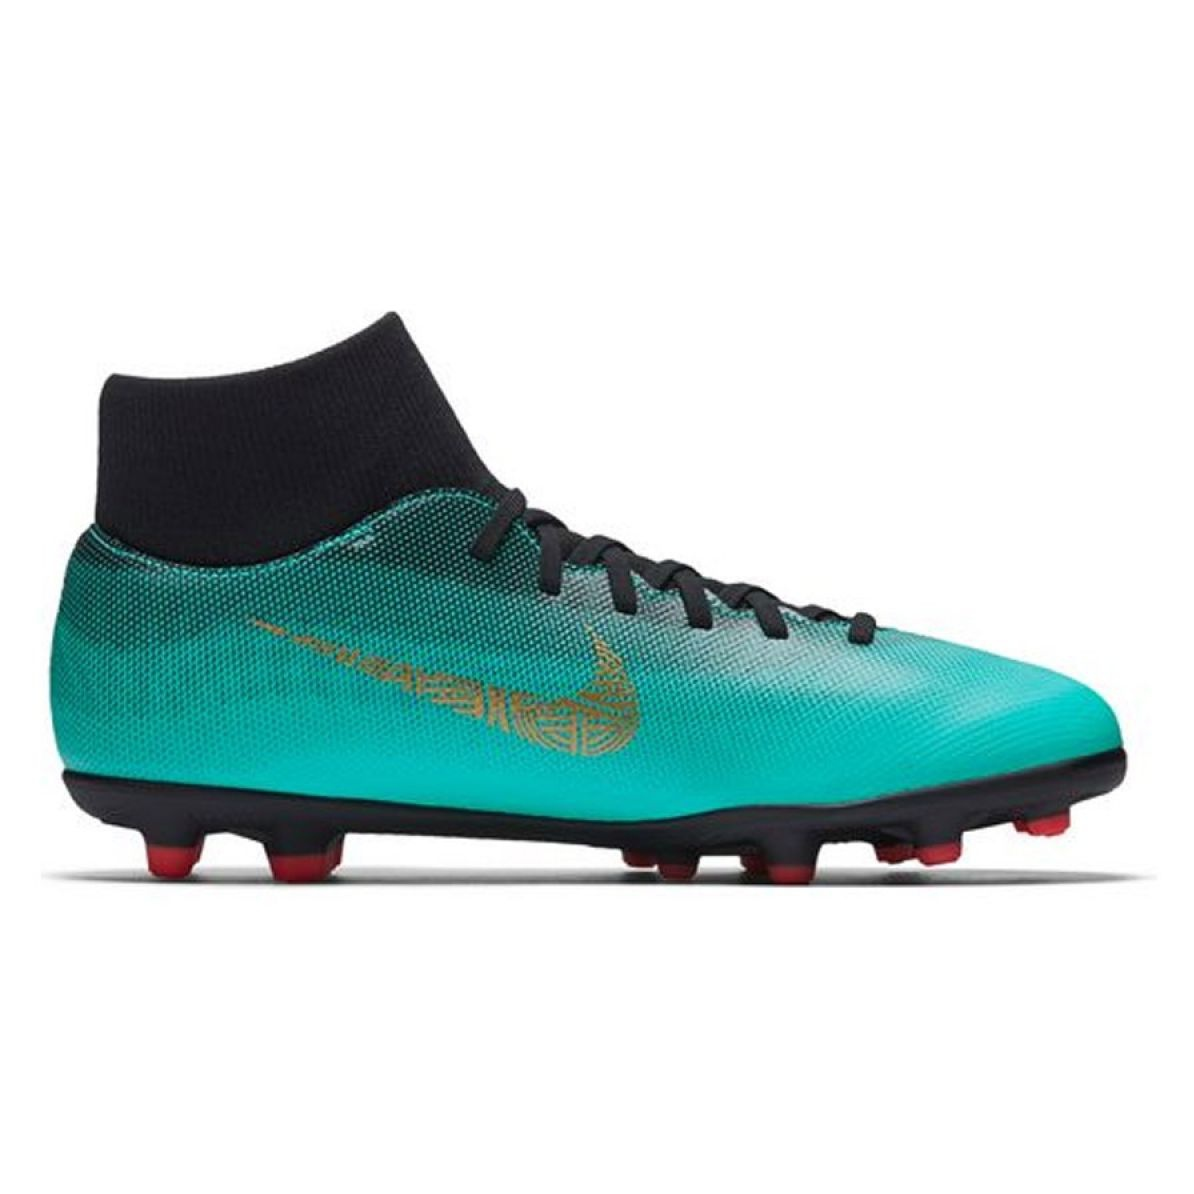 scarpe nike mercurial calcio